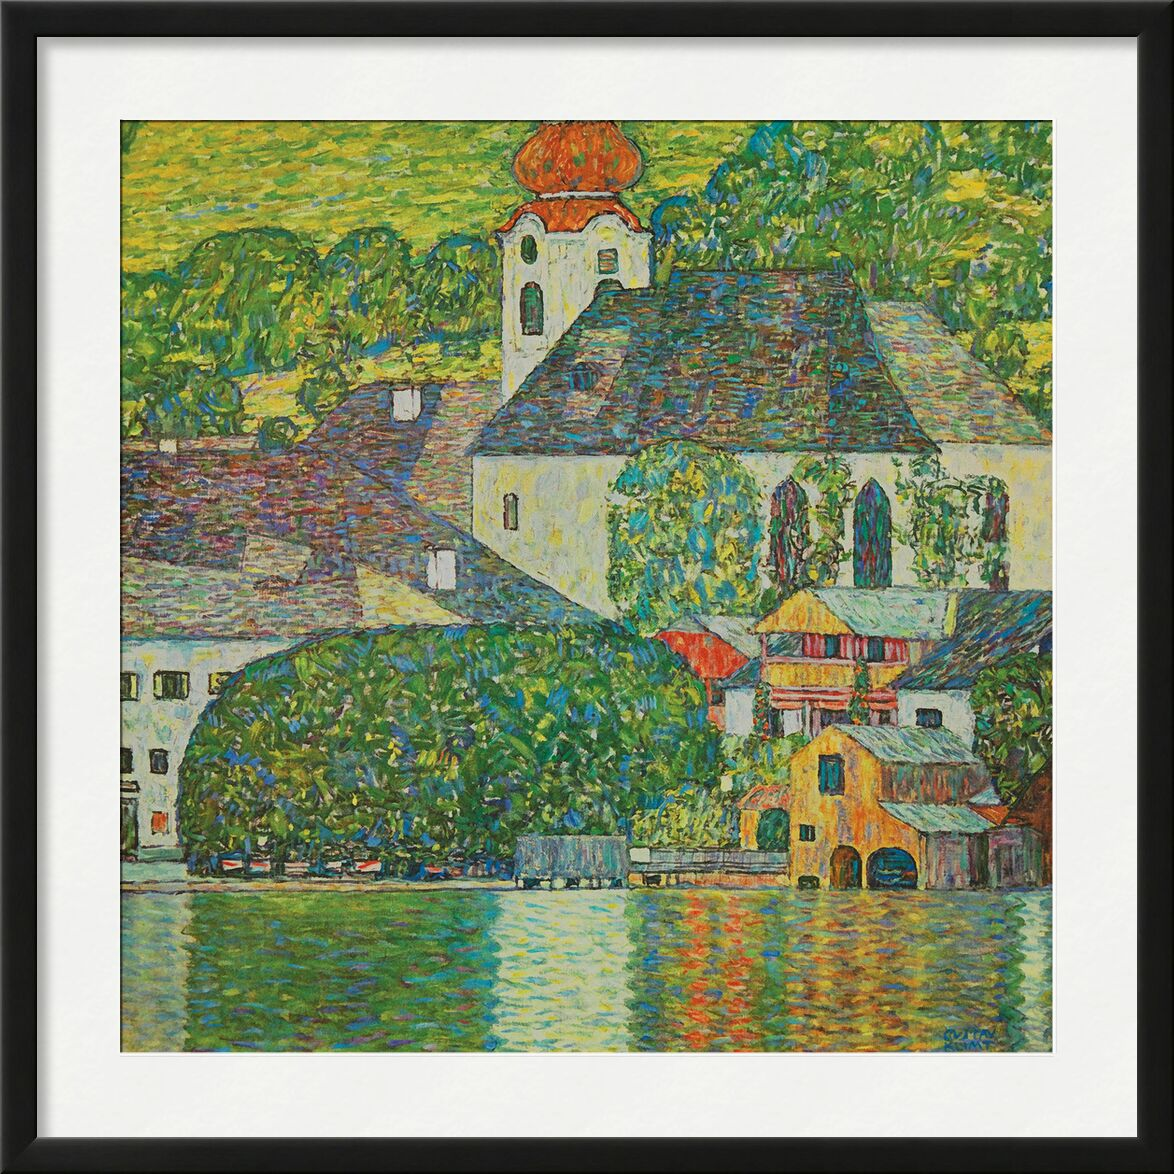 Church in Unterach on Attersee - Gustav Klimt from AUX BEAUX-ARTS, Prodi Art, KLIMT, church, painting, nature, village